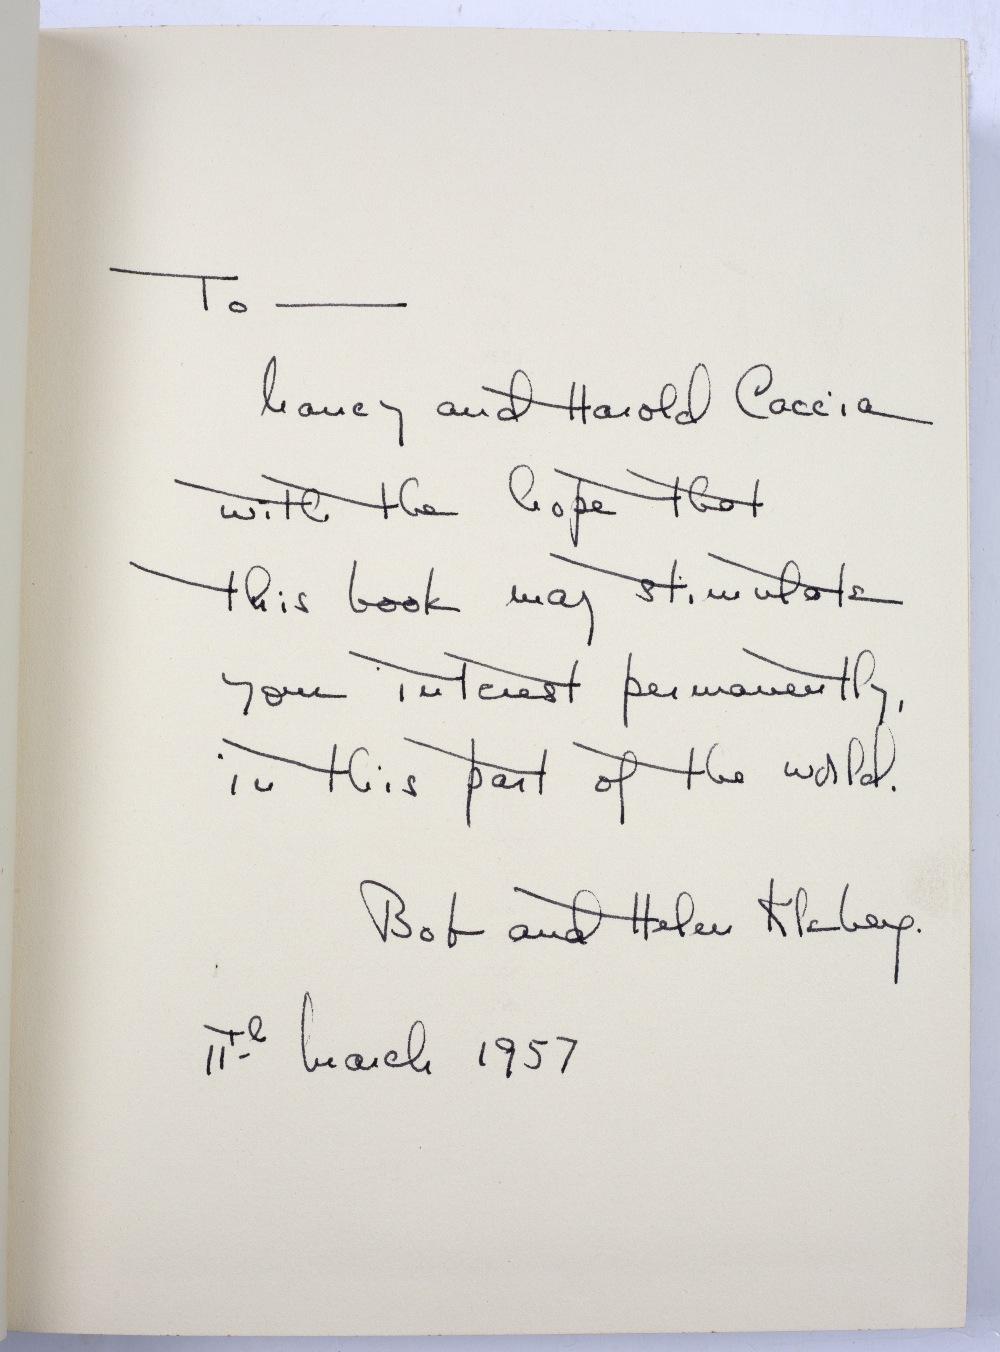 LEA, Tom, The King Ranch, Kingsville Texas. Carl Hertzog, El Paso 1957. Saddle Blanket Edition. - Image 5 of 7